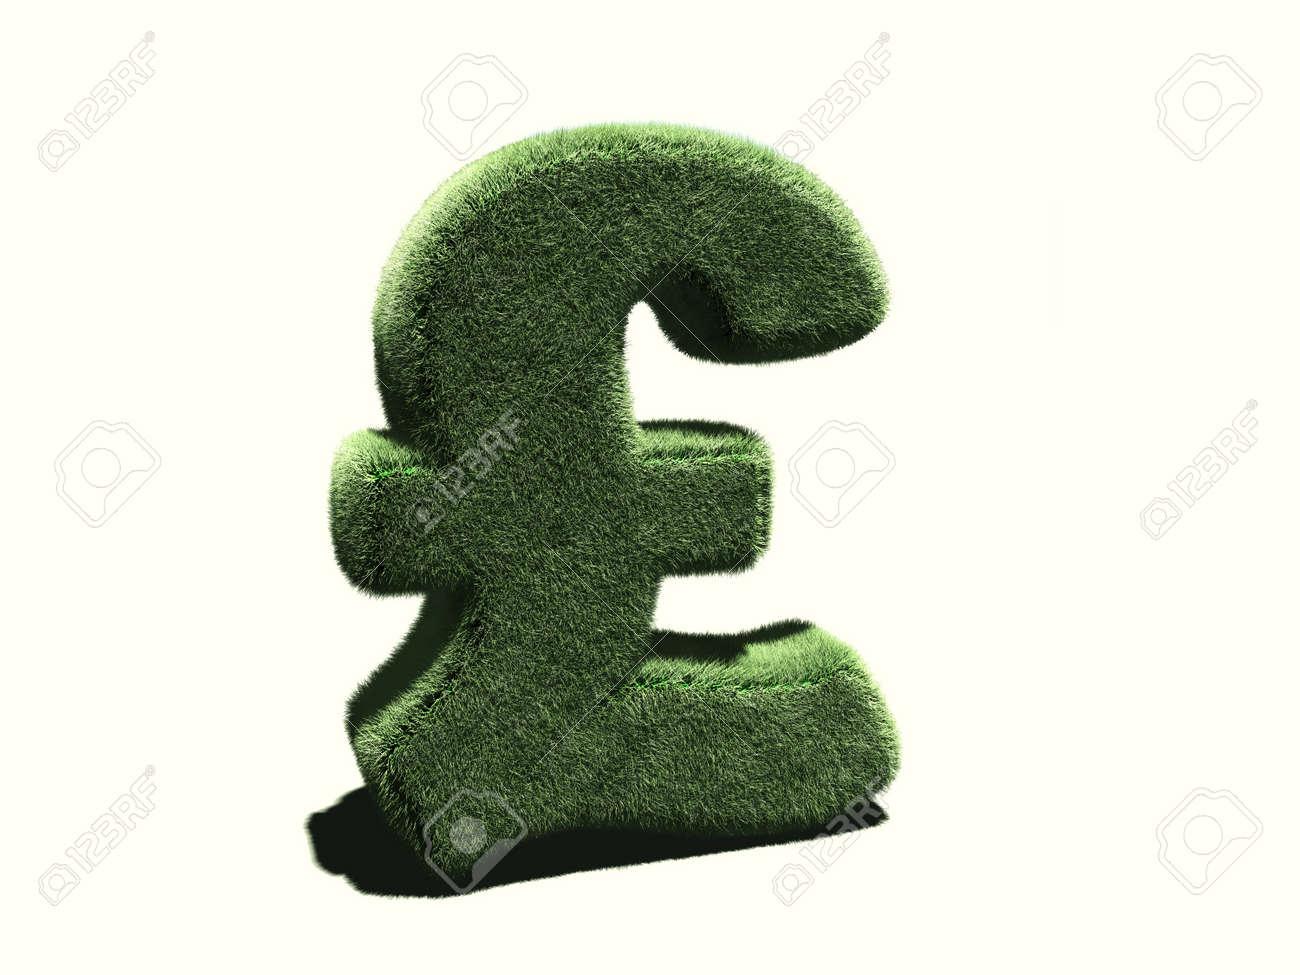 Grassy Livre Sterling Symbol